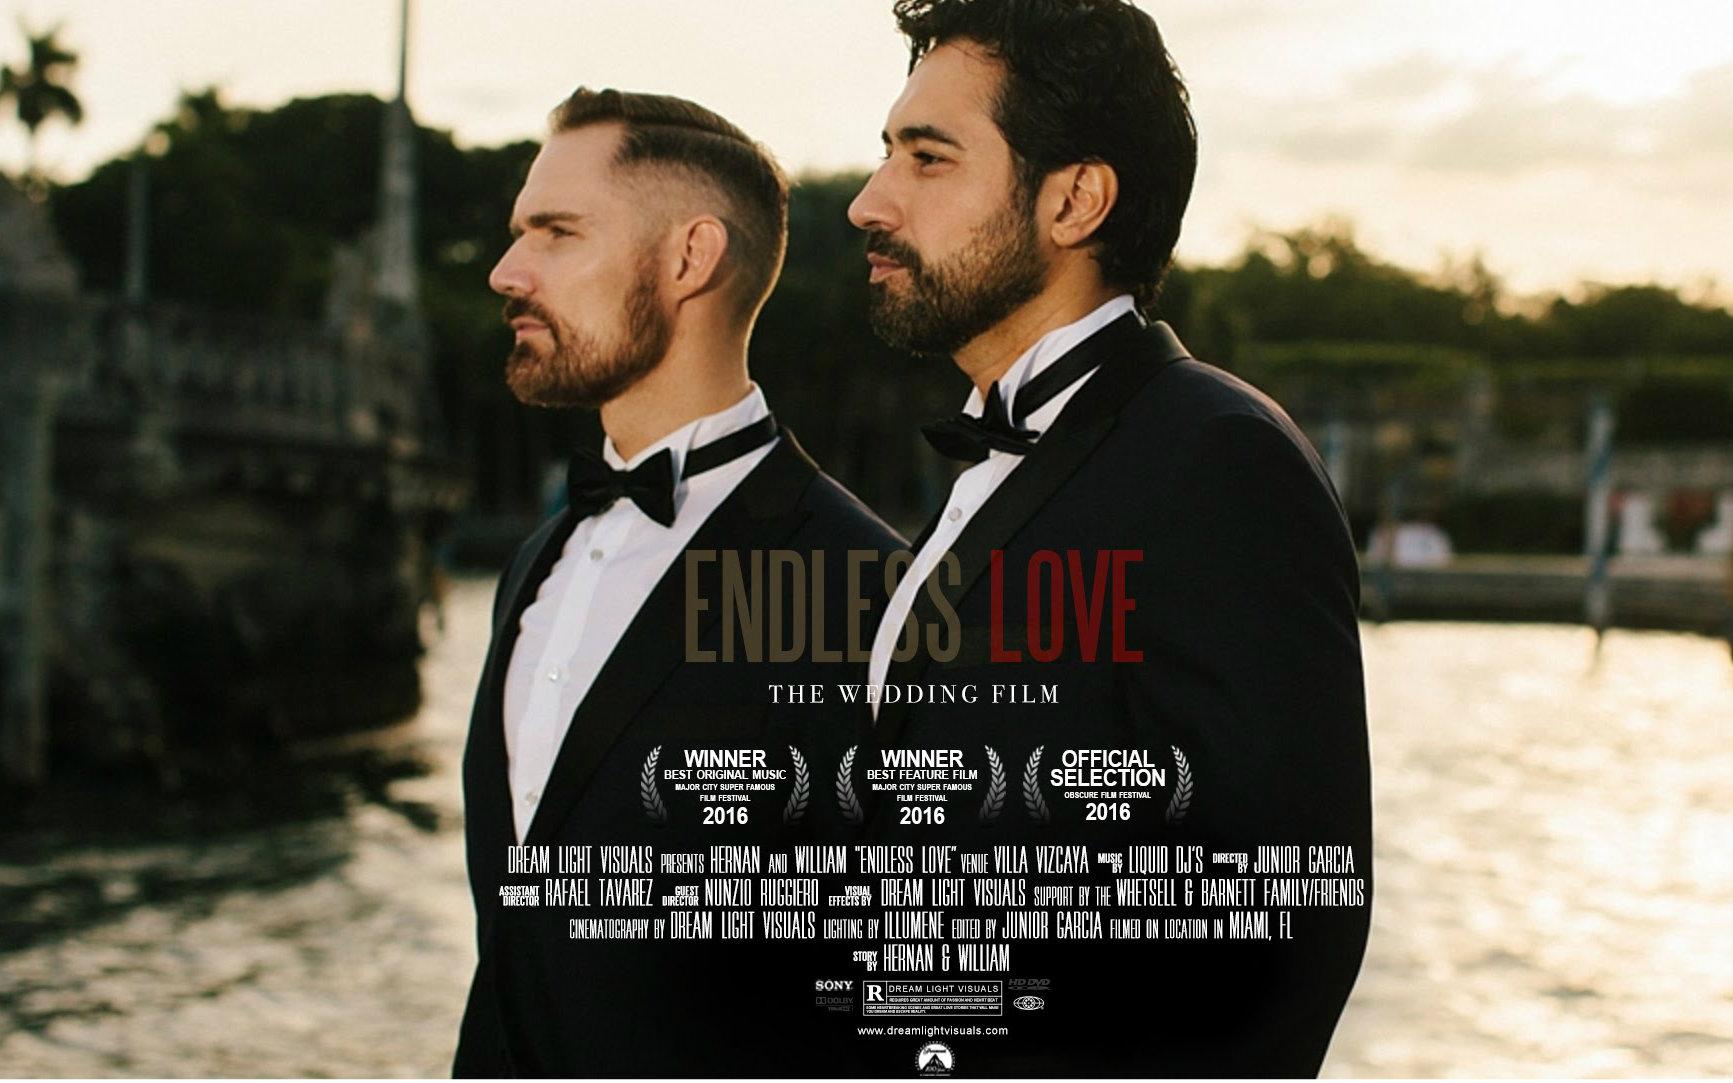 【同性】[hernan&william] 超美好的同志婚礼 amazing gay wedding